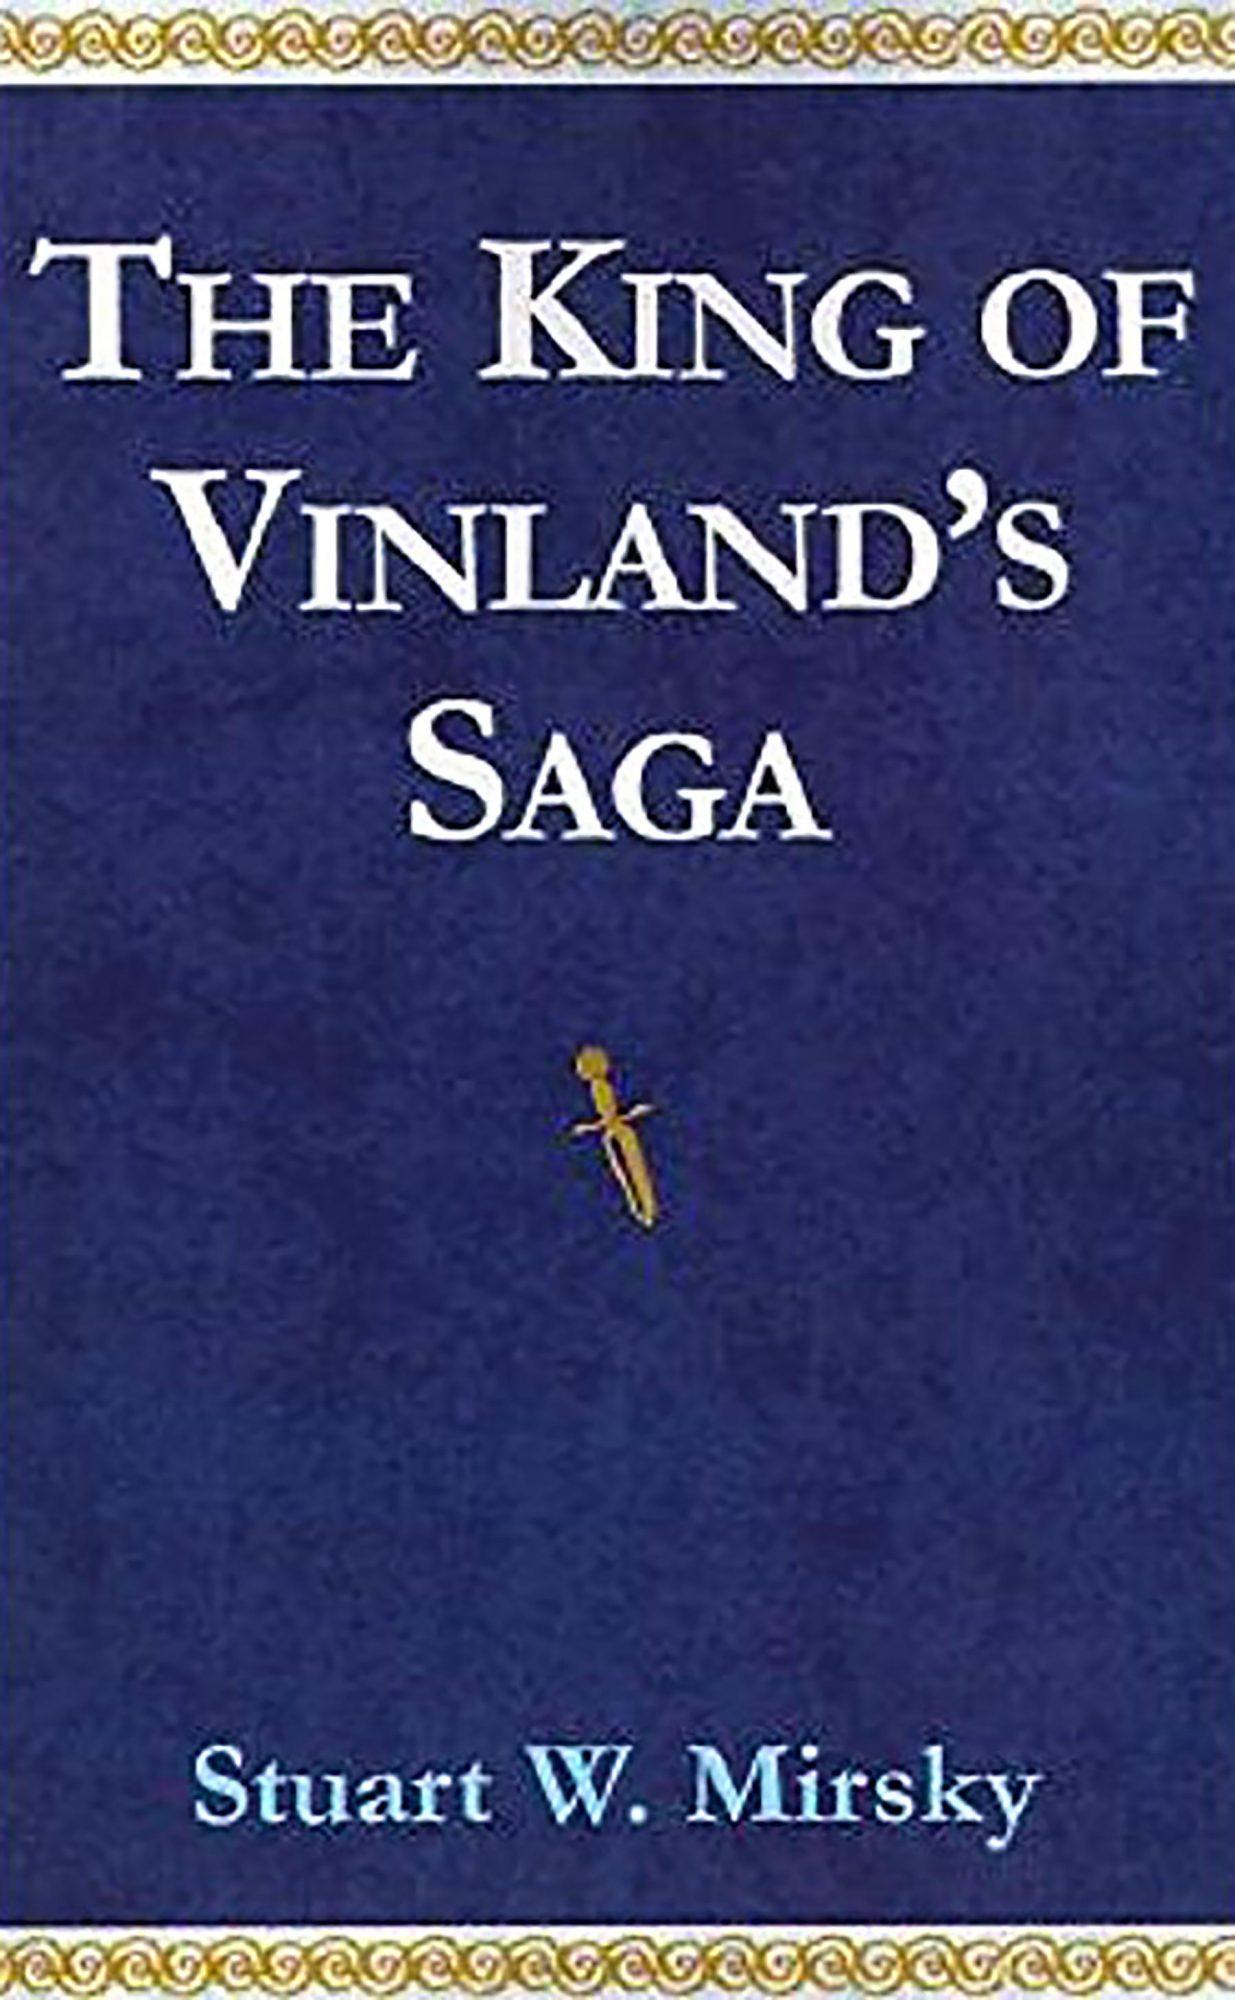 Stuart W. Mirsky,The King of Vinland's Saga